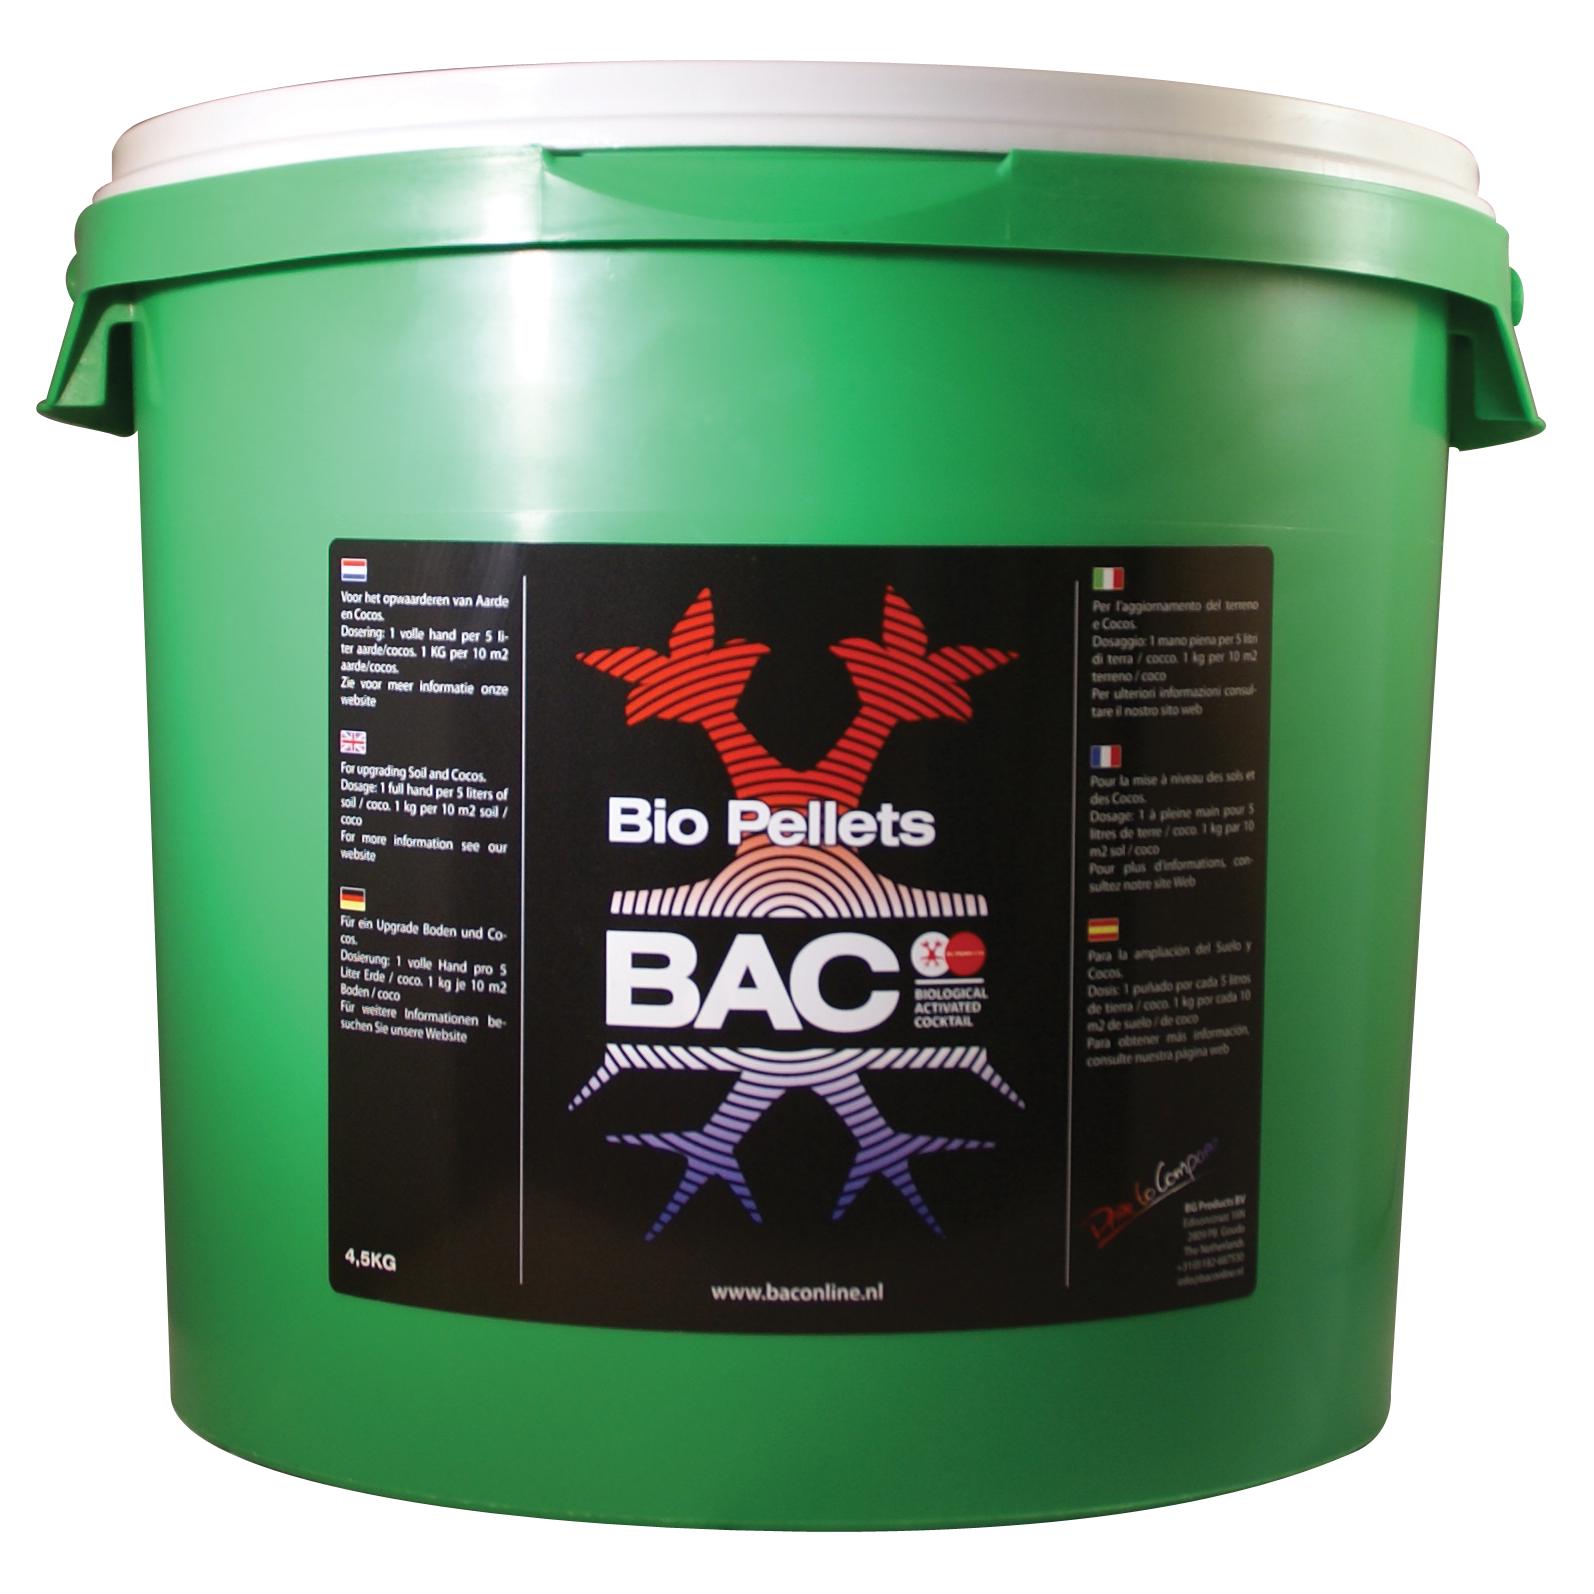 BAC - биозерна (Bio Pellets)